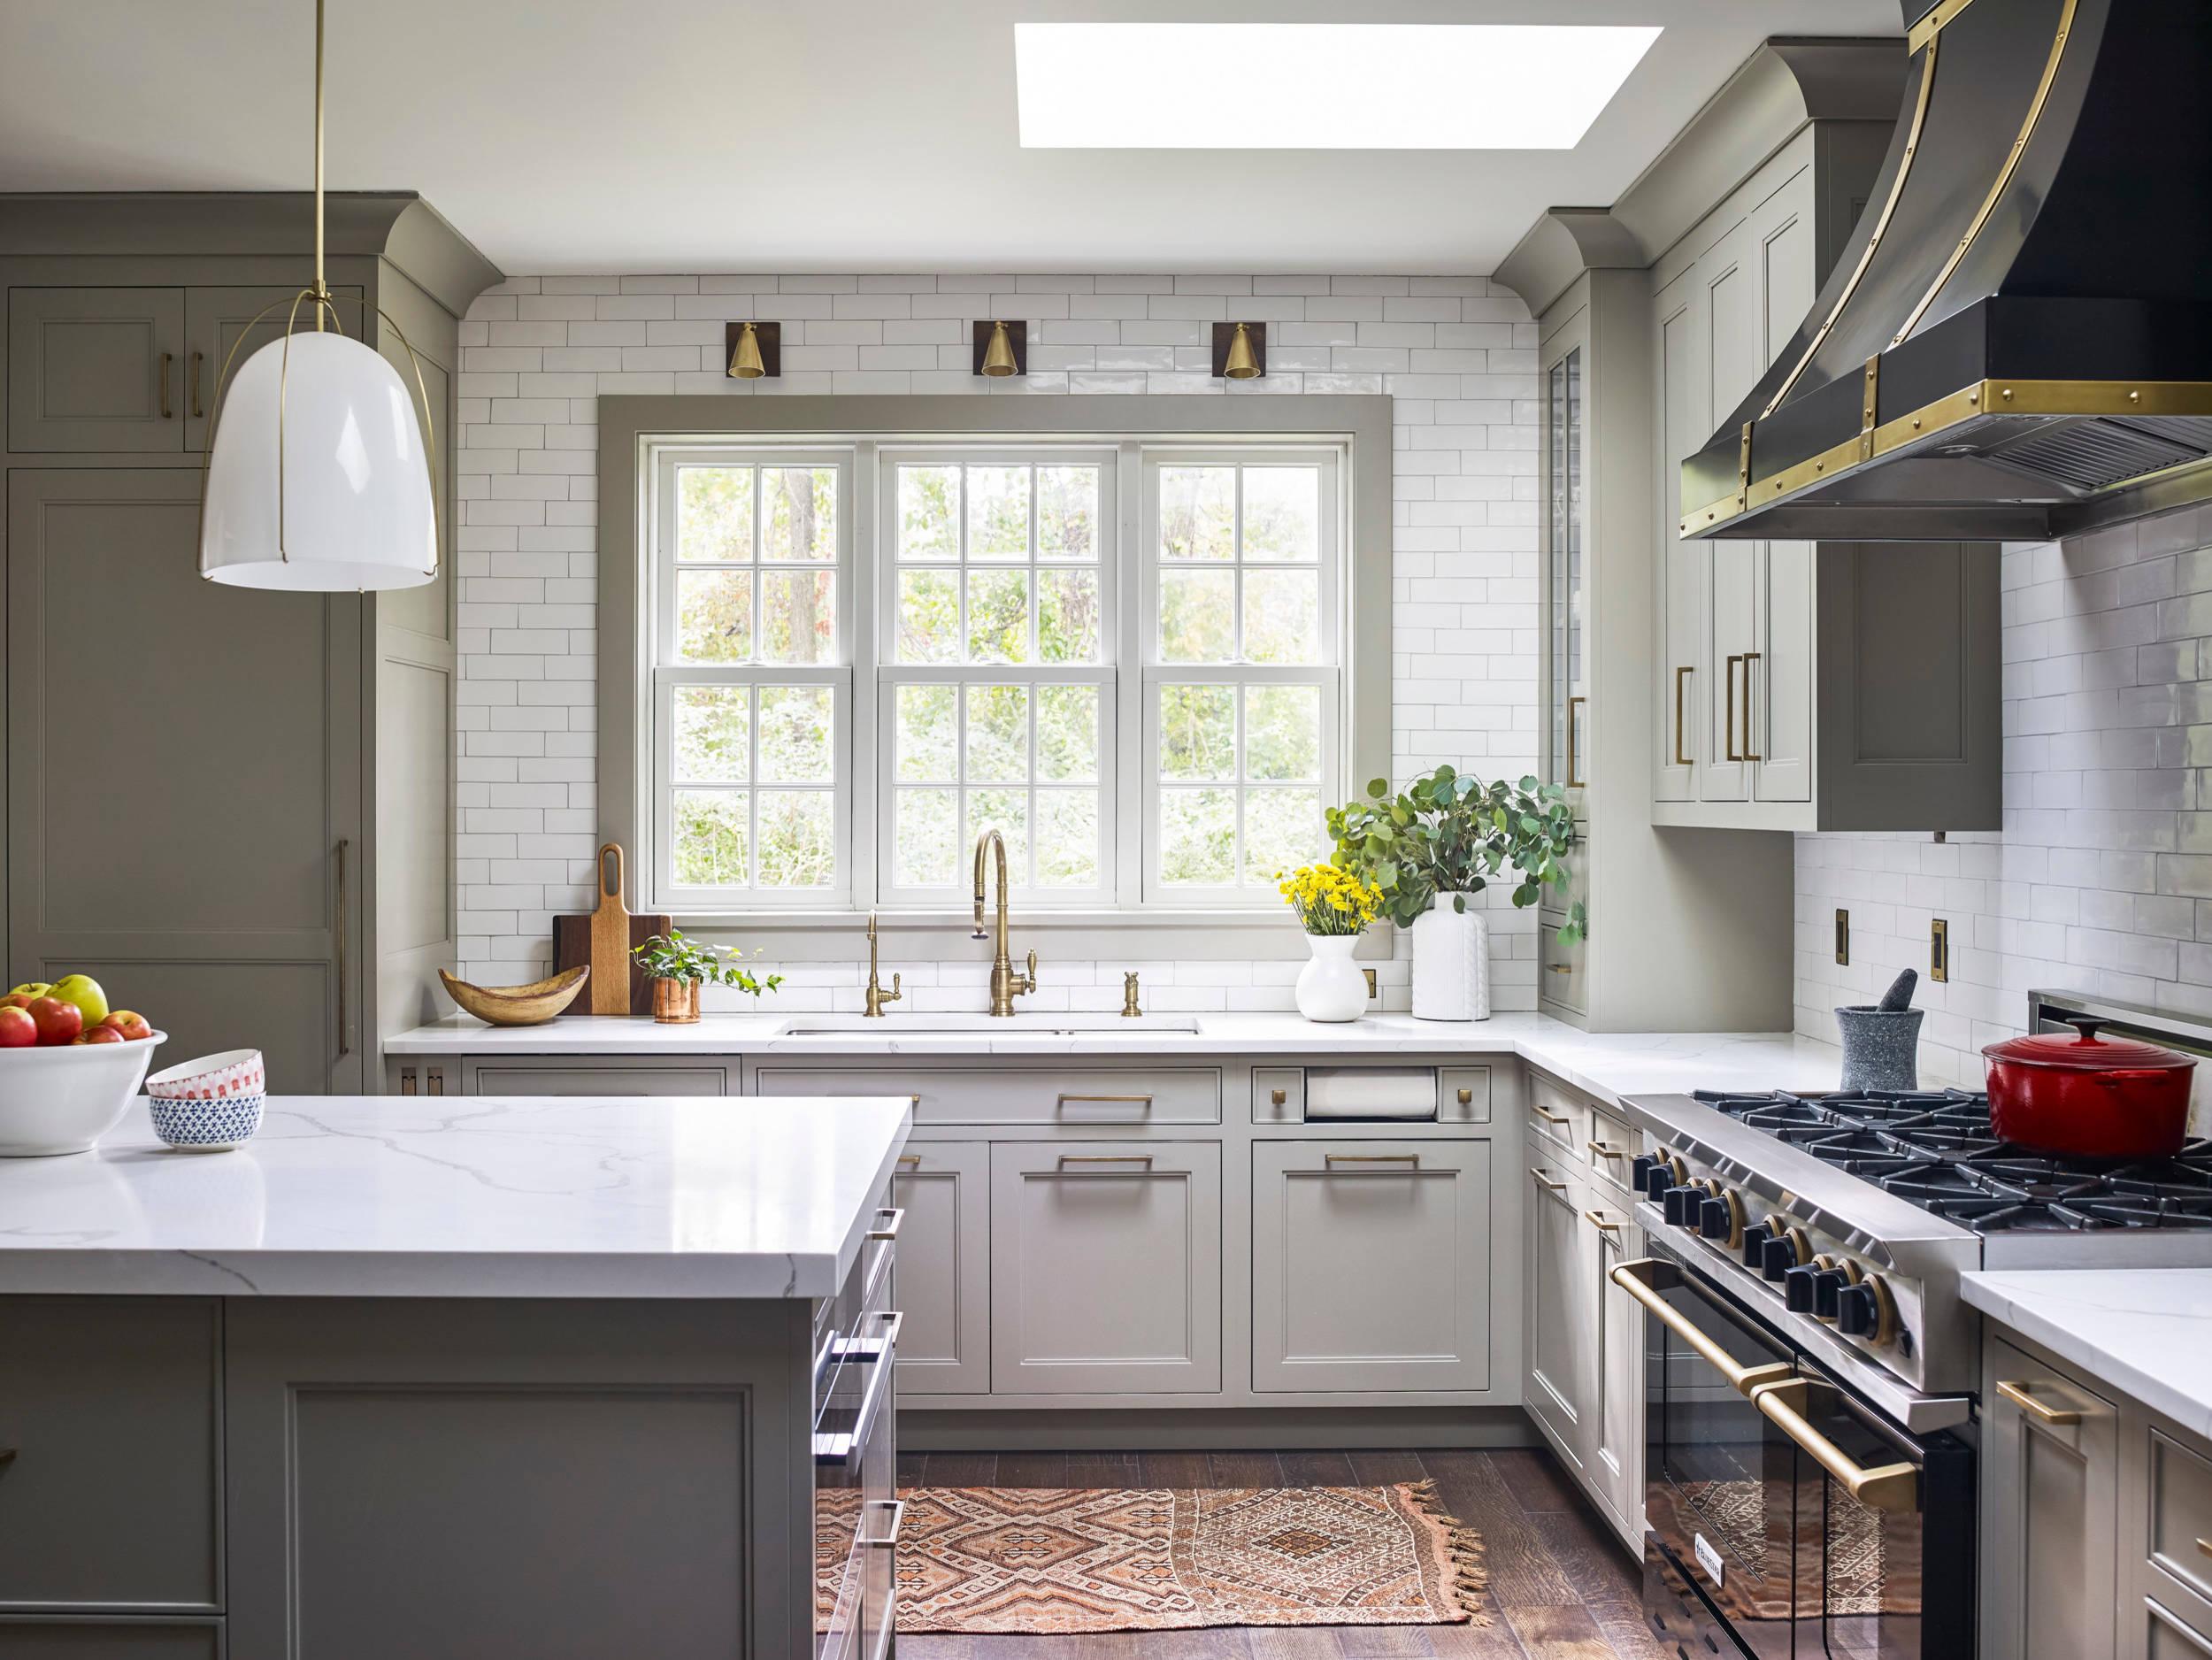 75 Beautiful White Kitchen With Black Appliances Pictures Ideas November 2020 Houzz